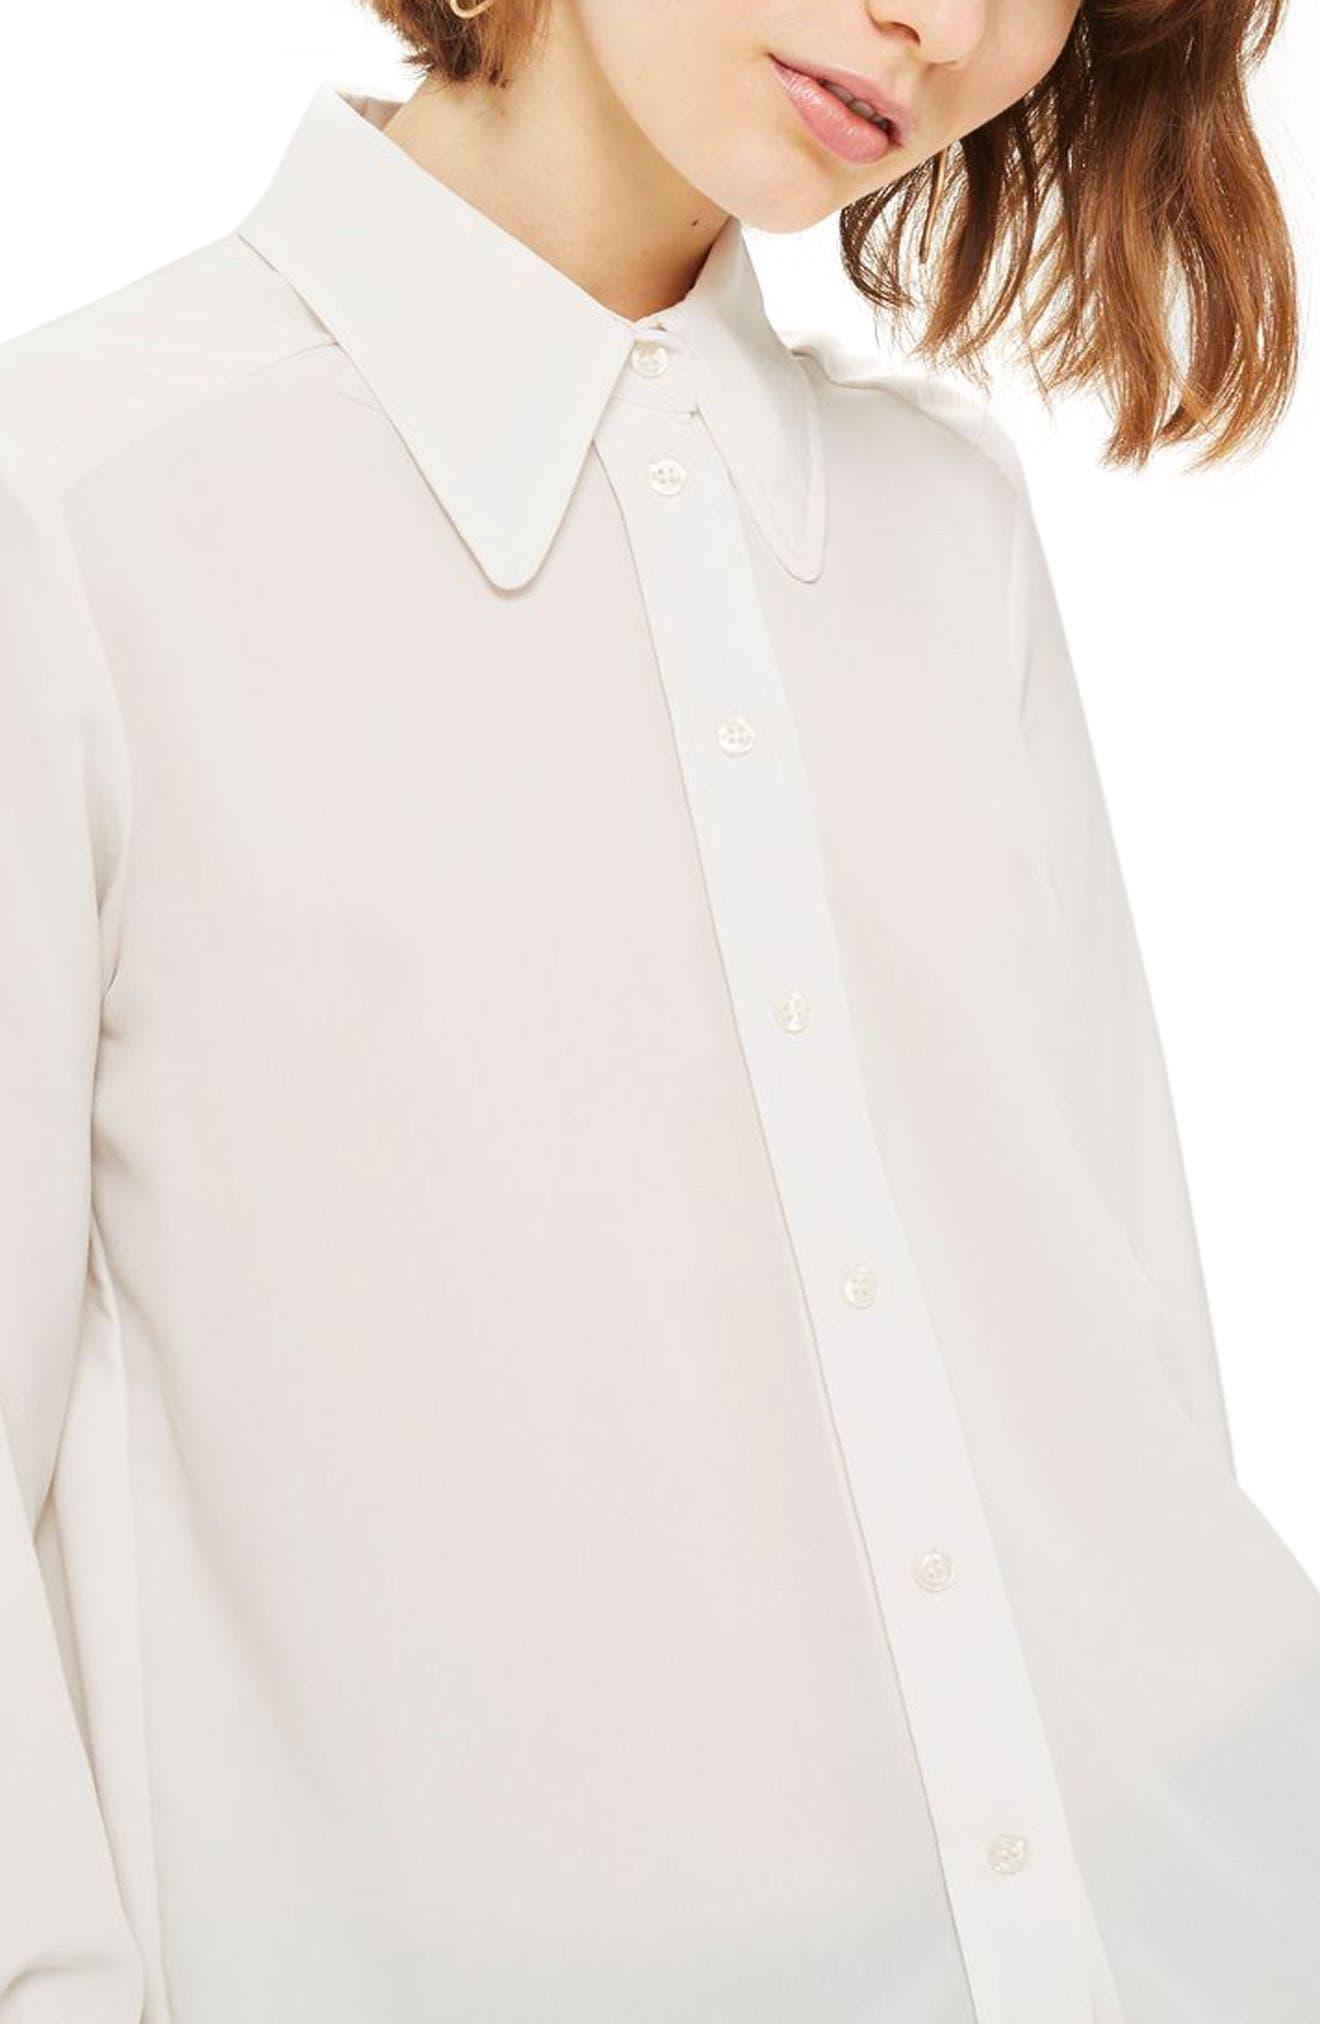 '70s Collar Shirt,                         Main,                         color, Ivory